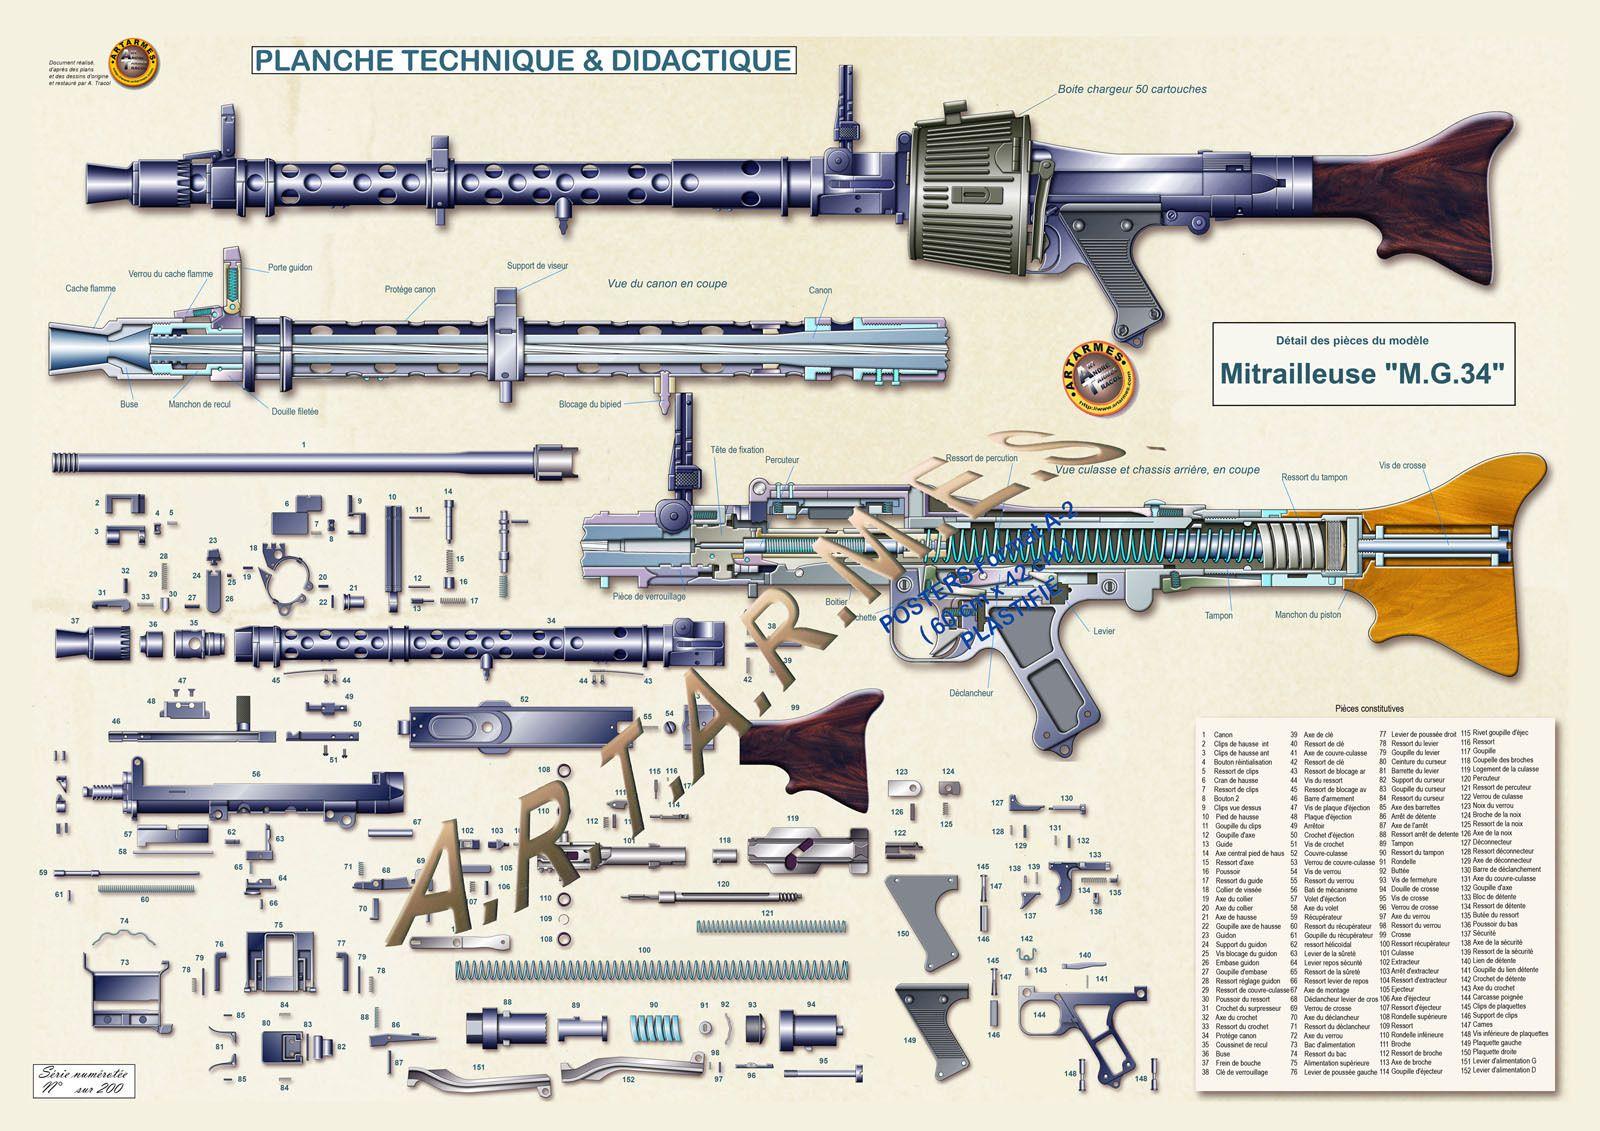 M G 34 Mitrailleuse Poster Technique Didactique